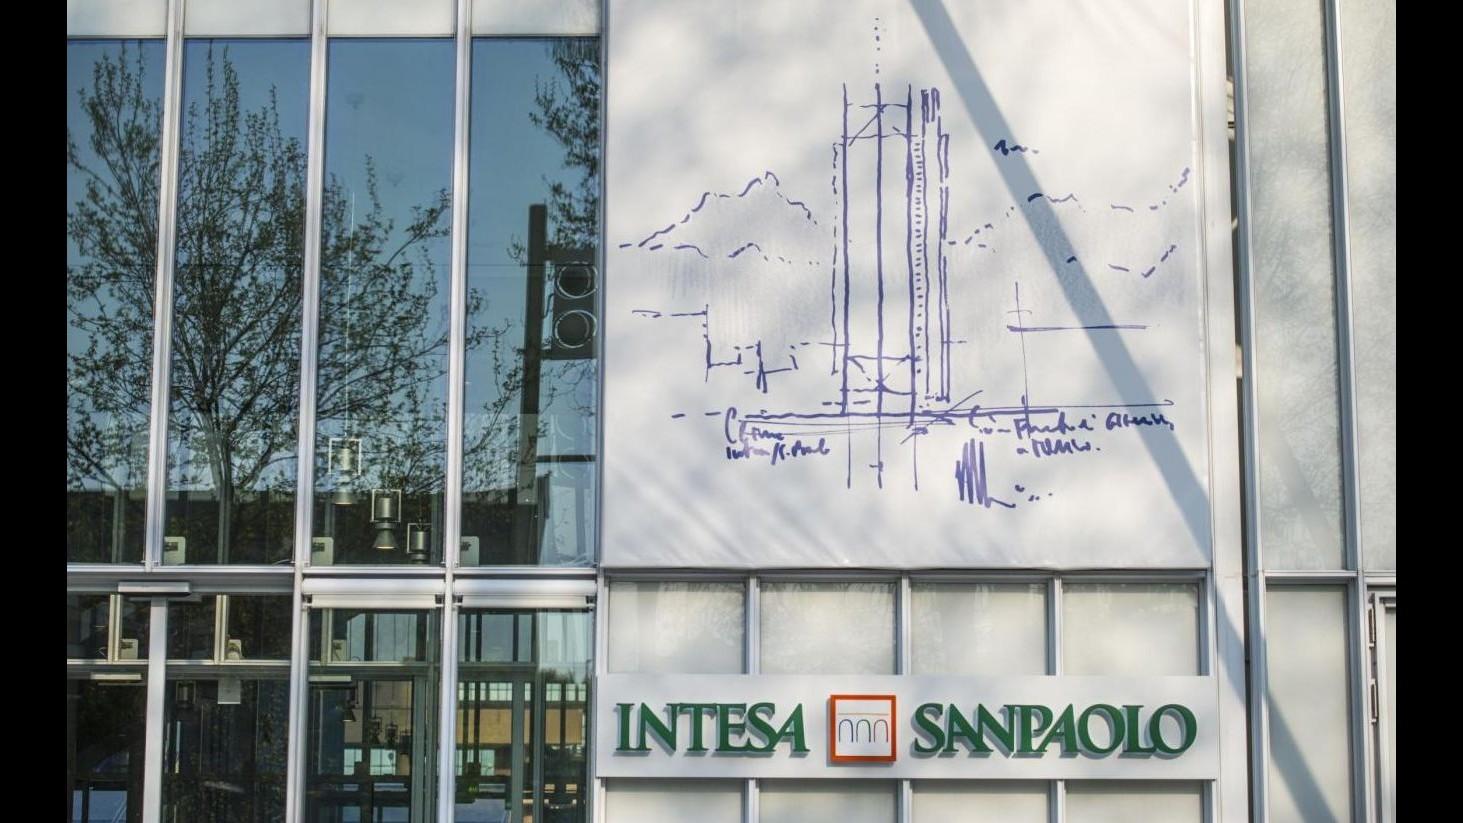 Intesa Sp vende 5,7% di Bankitalia per 430 milioni